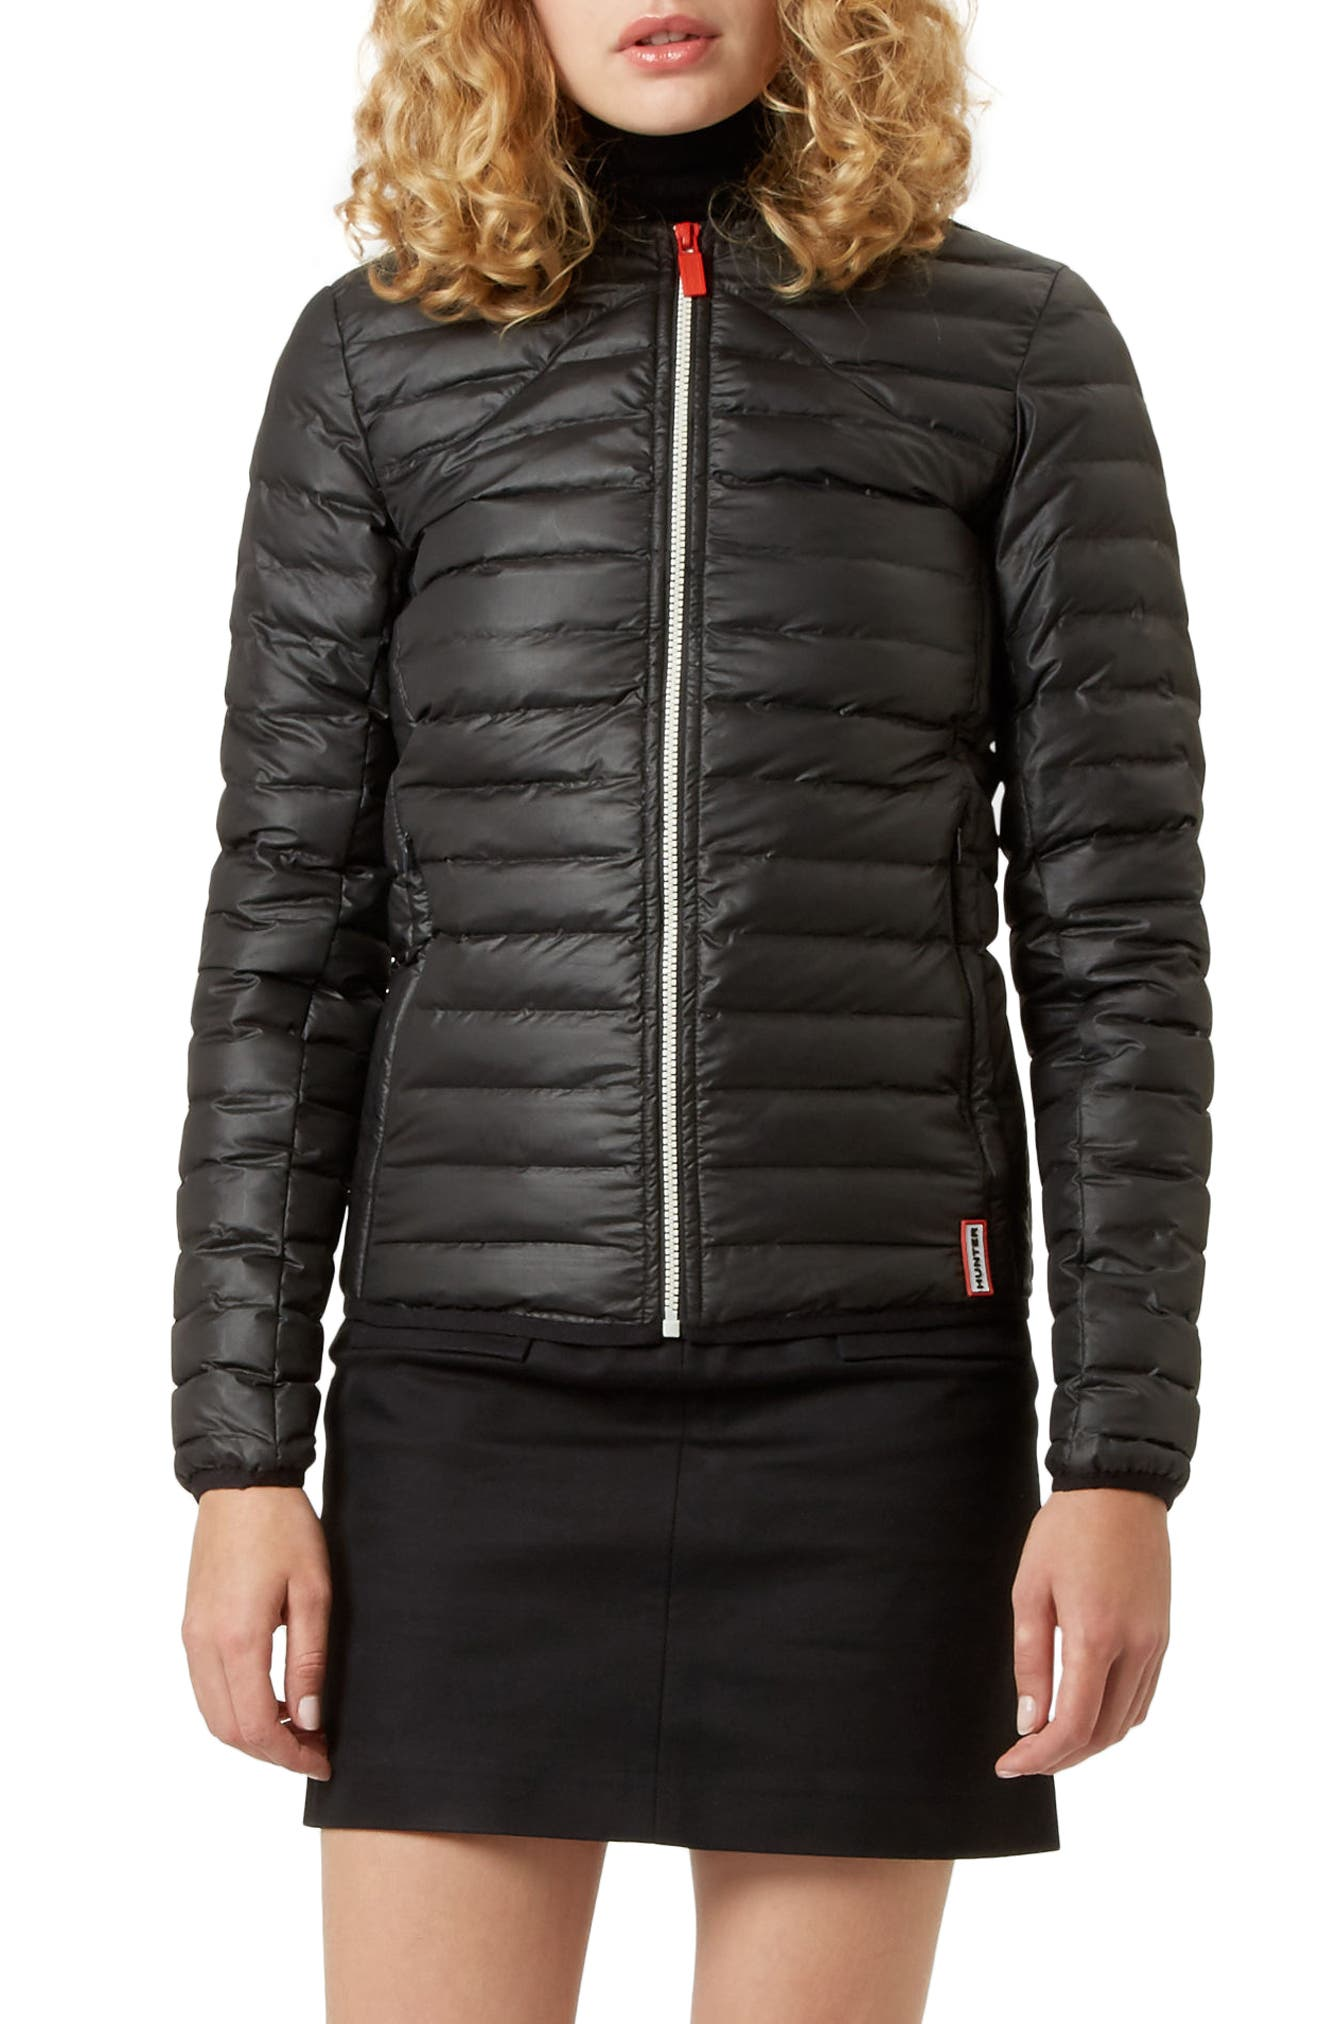 Main Image - Hunter Original Midlayer Water Resistant Thermolite® Insulated Jacket